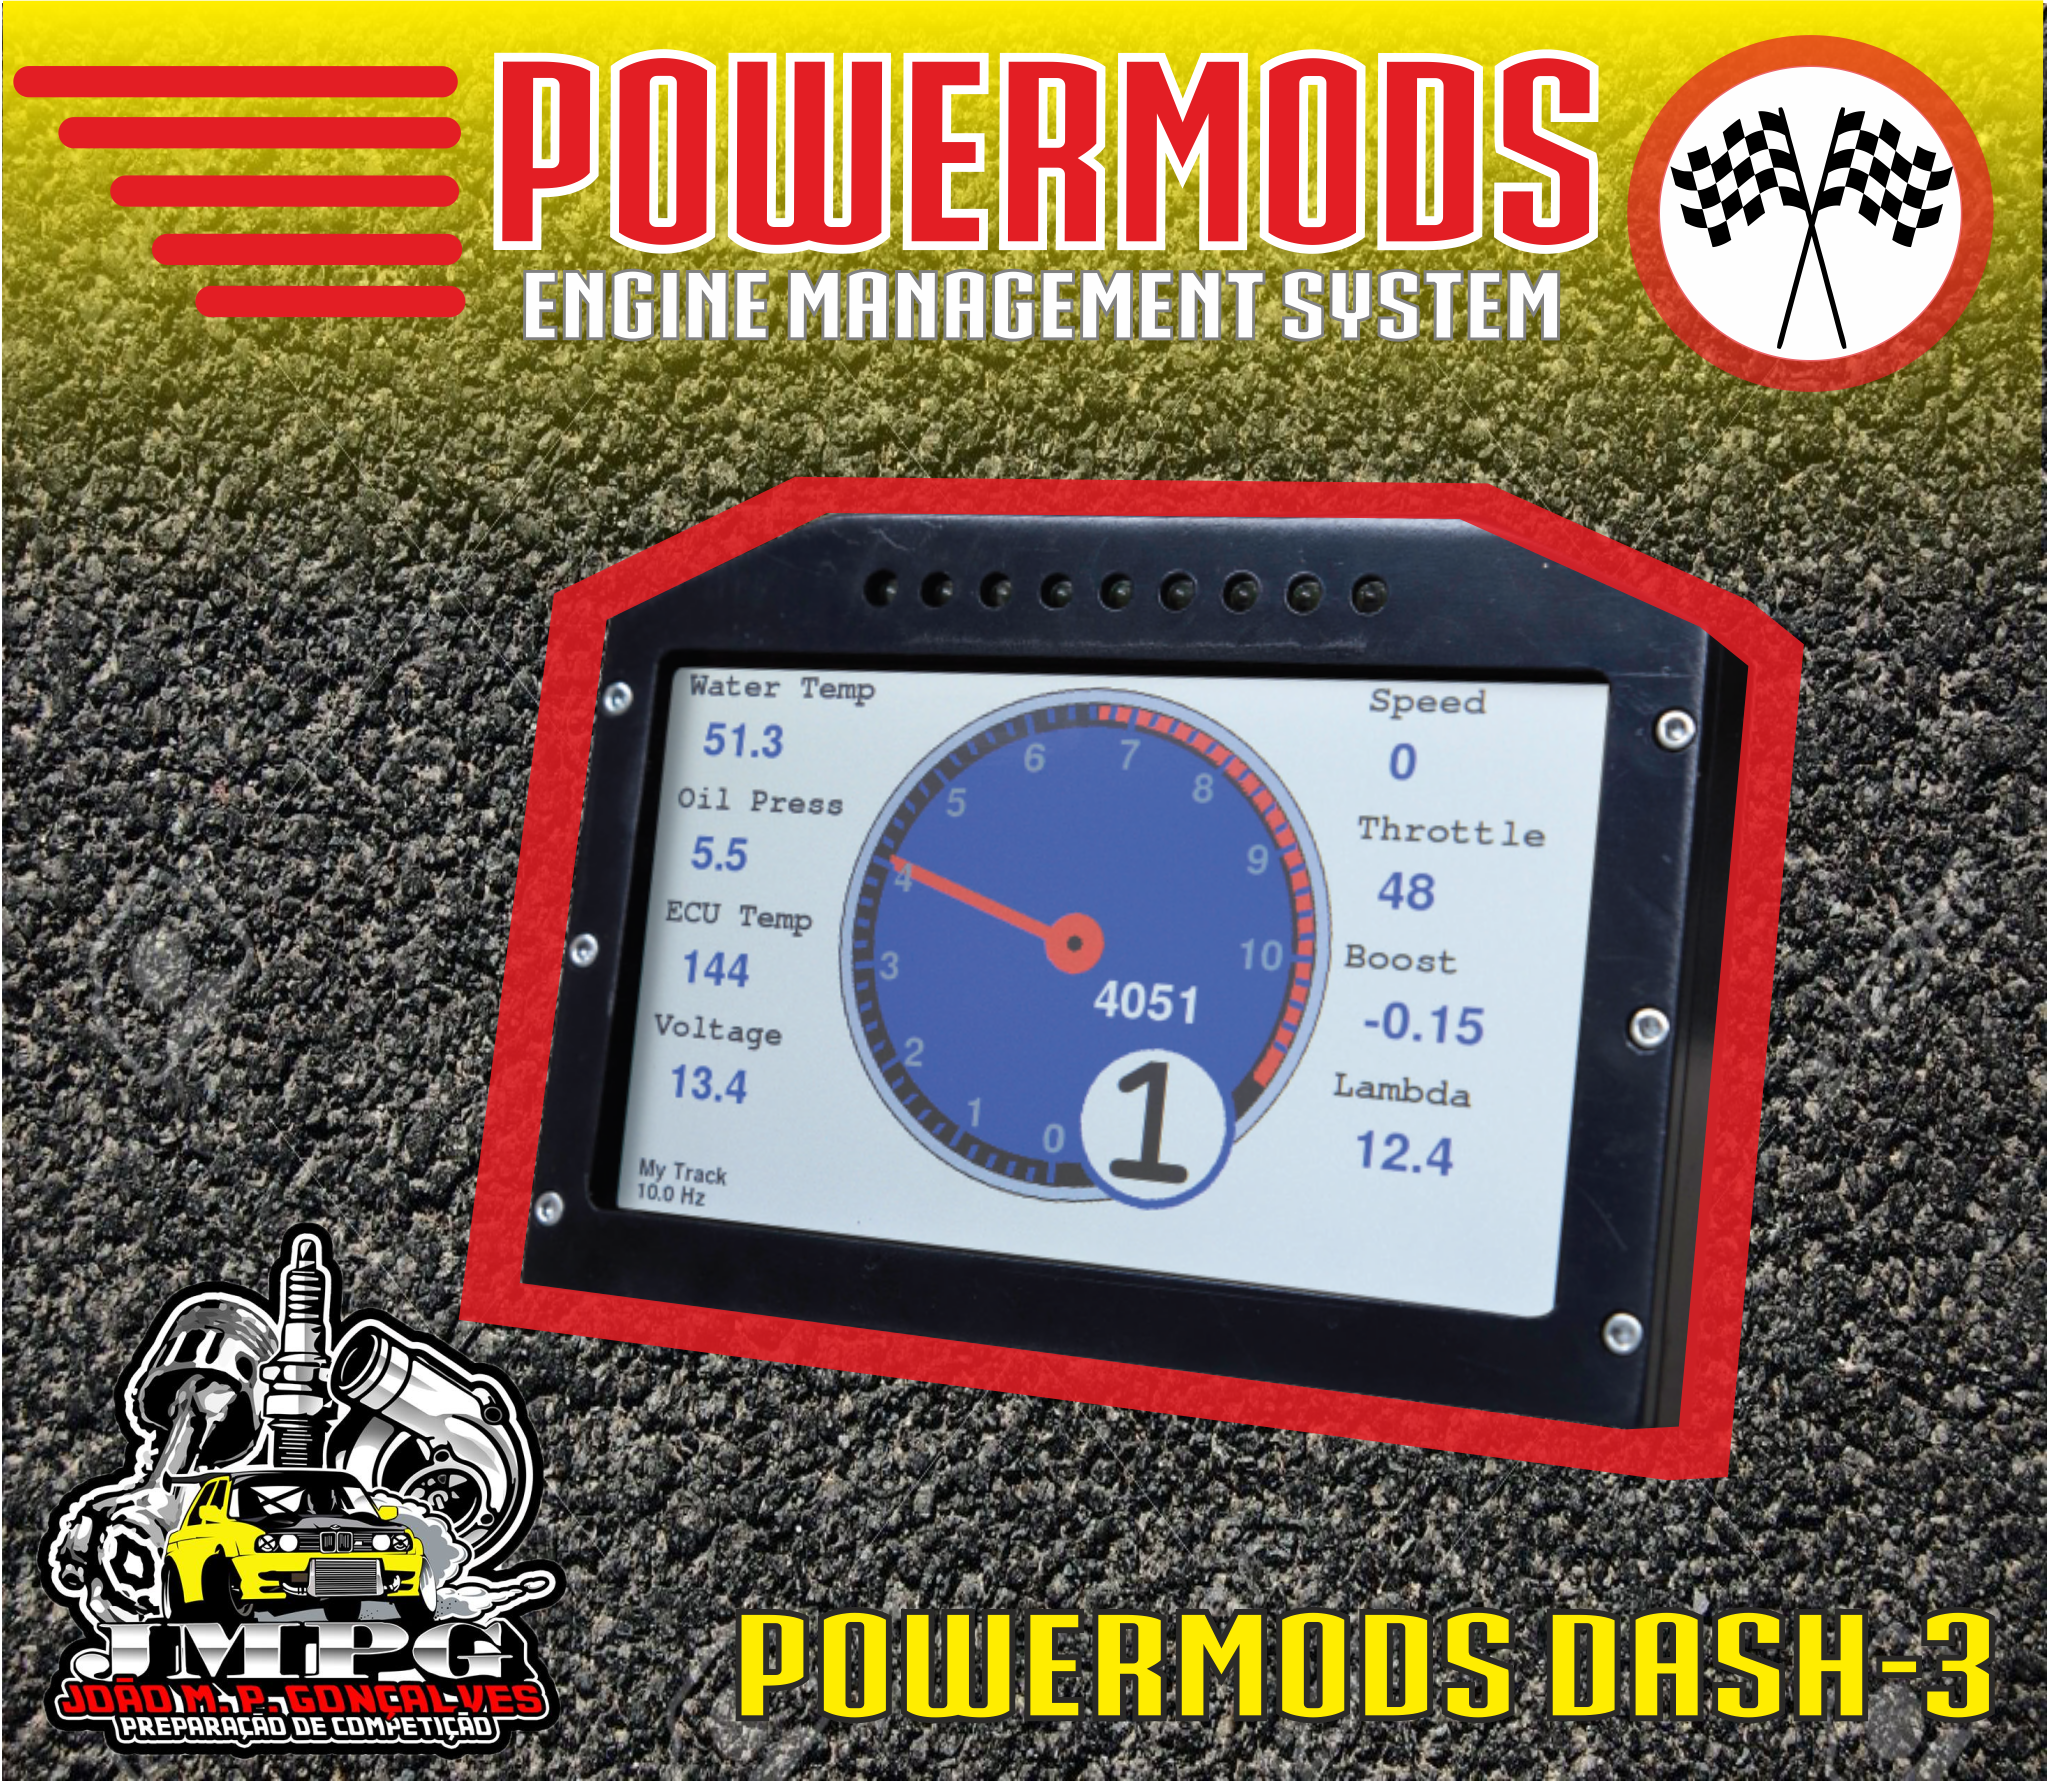 Powermods Dash-3